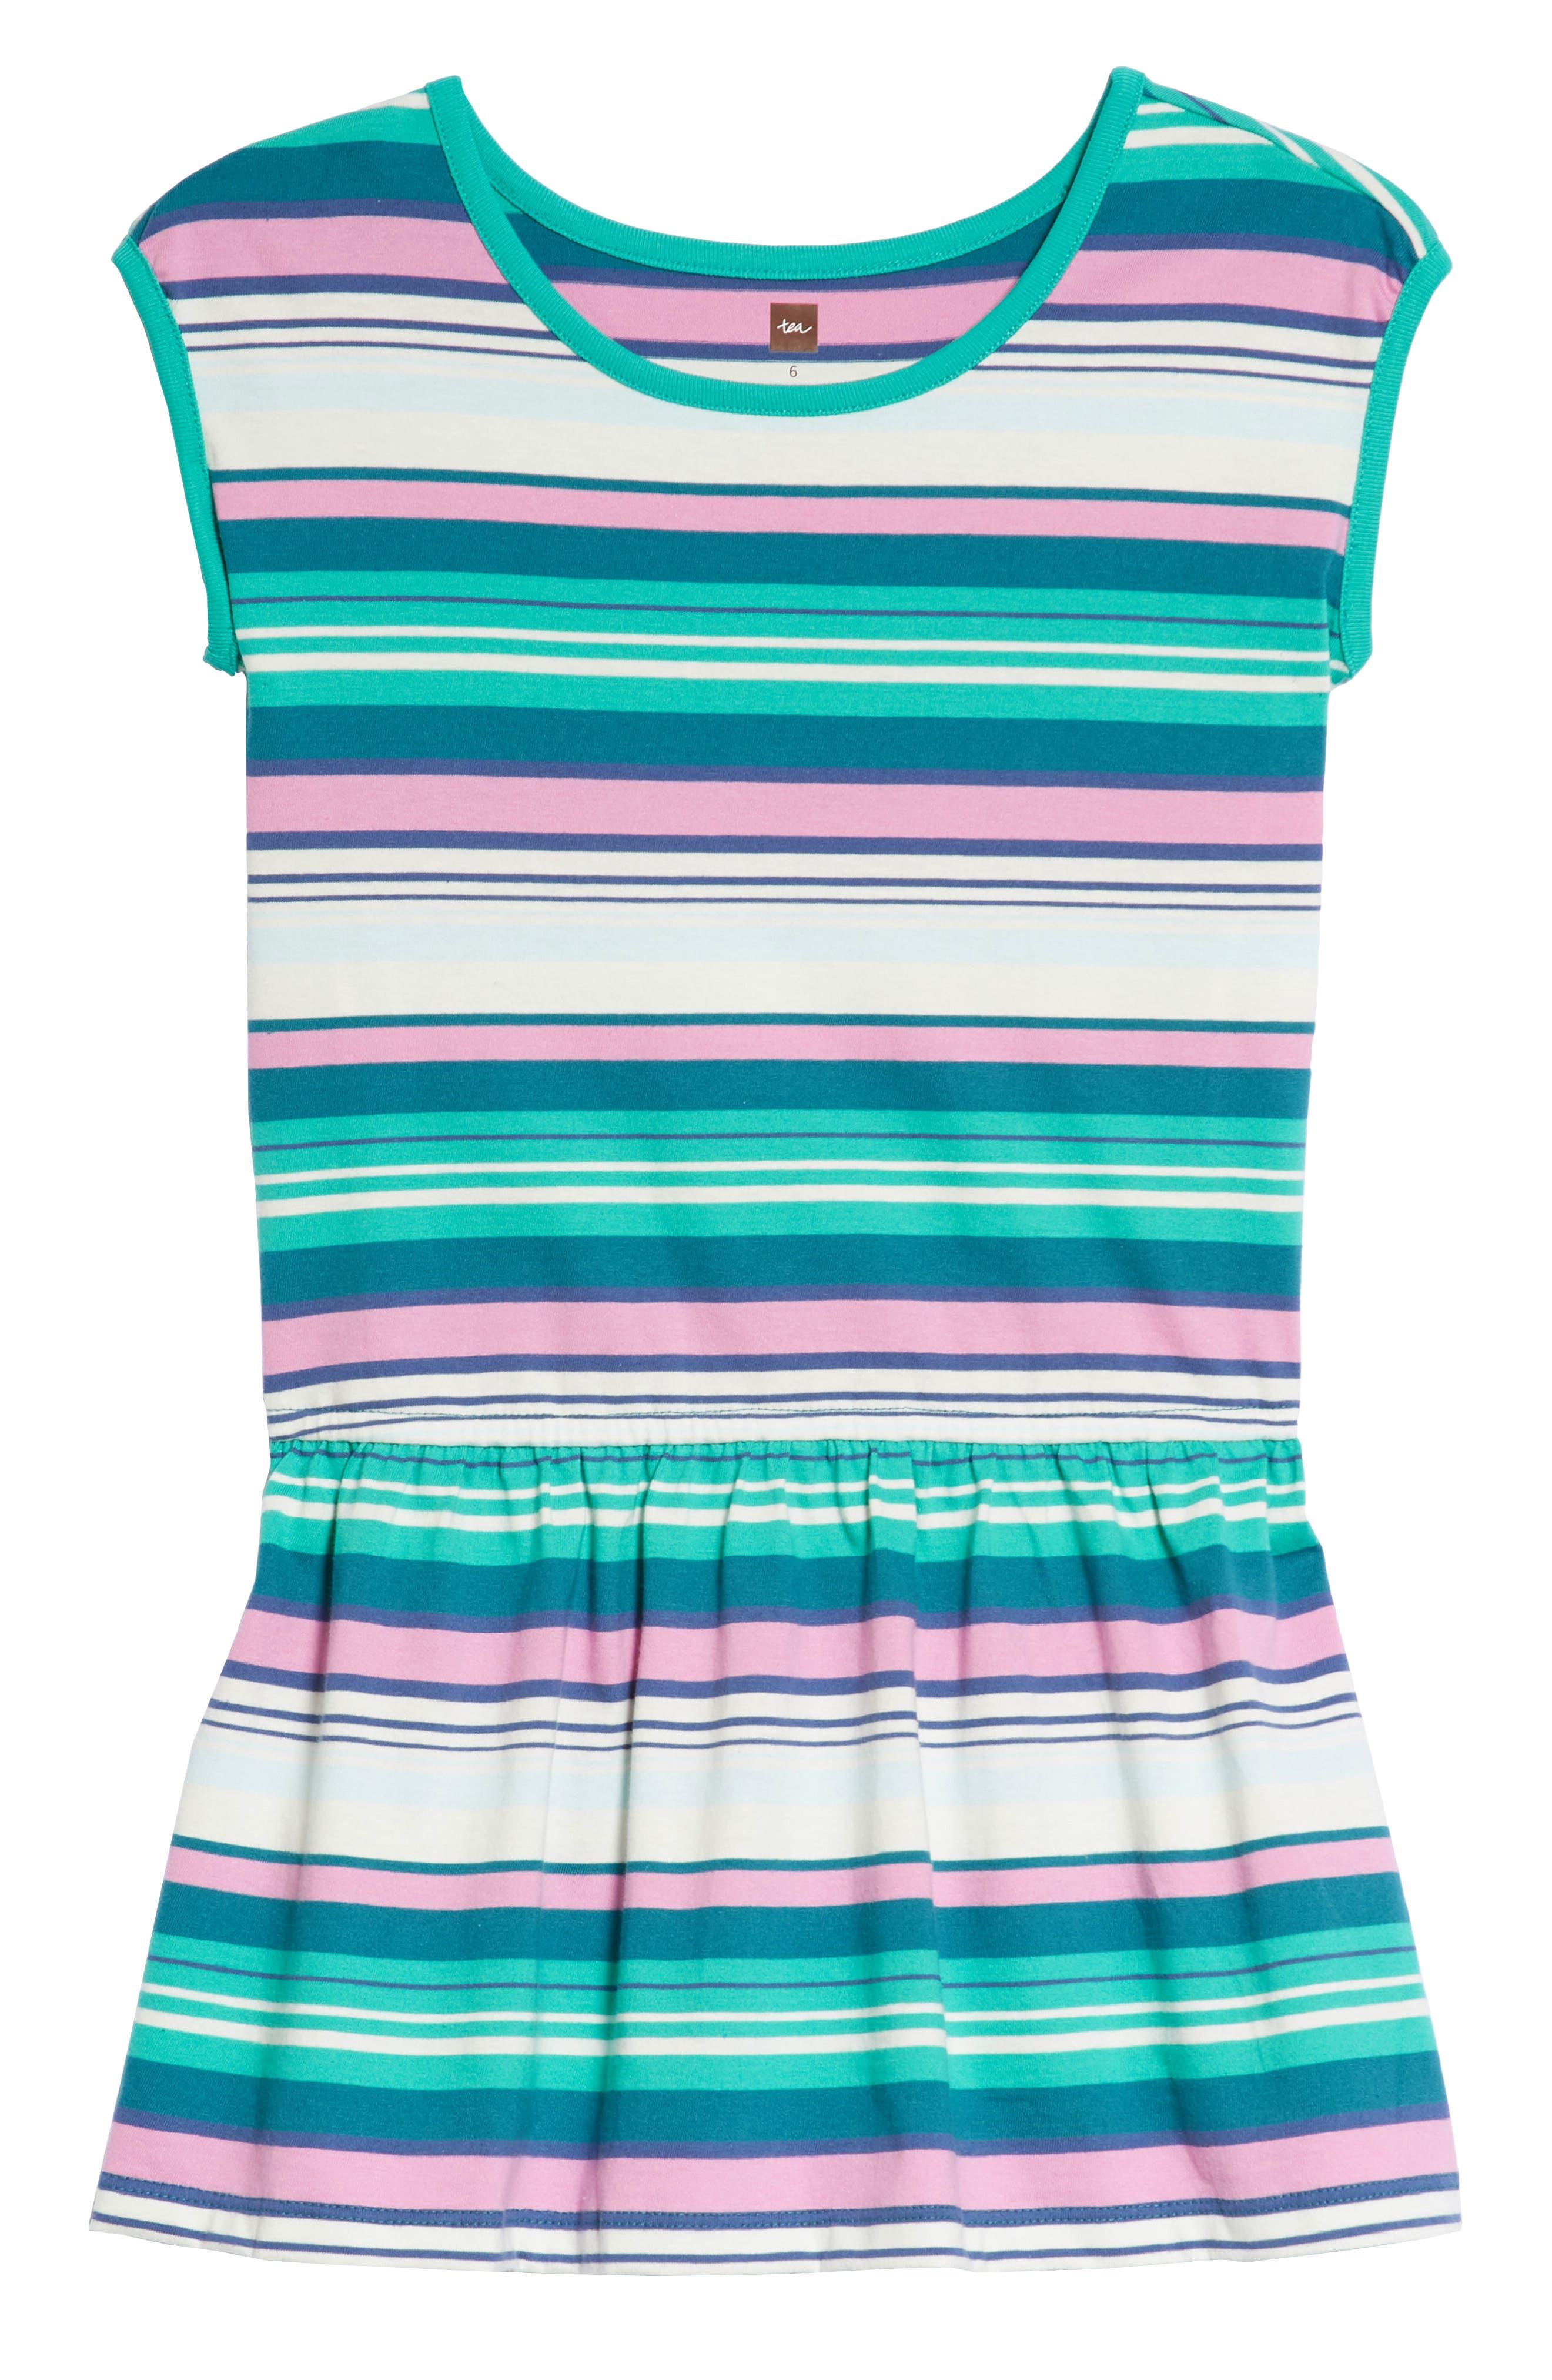 Tea Collection Vibrant Stripe Dress (Toddler Girls, Little Girls & Big Girls)